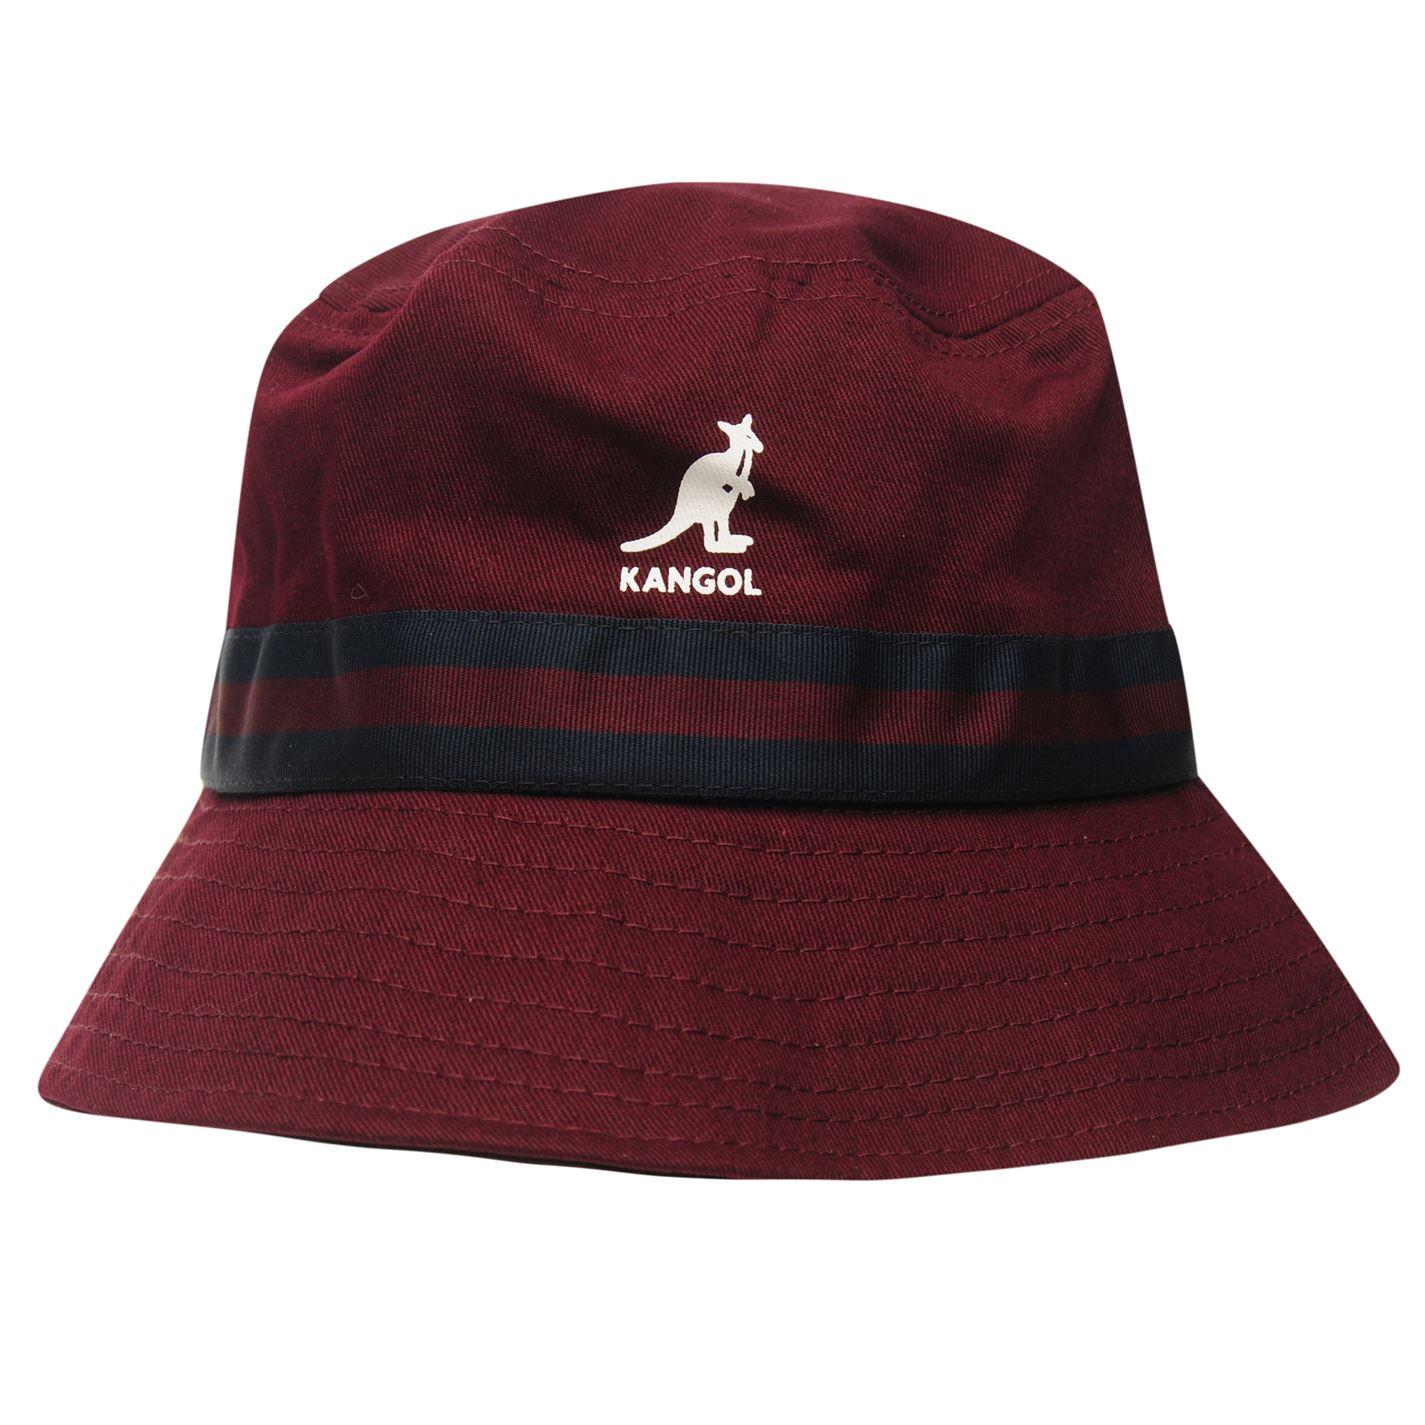 979c8f7d3db07 Kangol-Mens-Stripe-Bucket-Hat-Cotton thumbnail 12